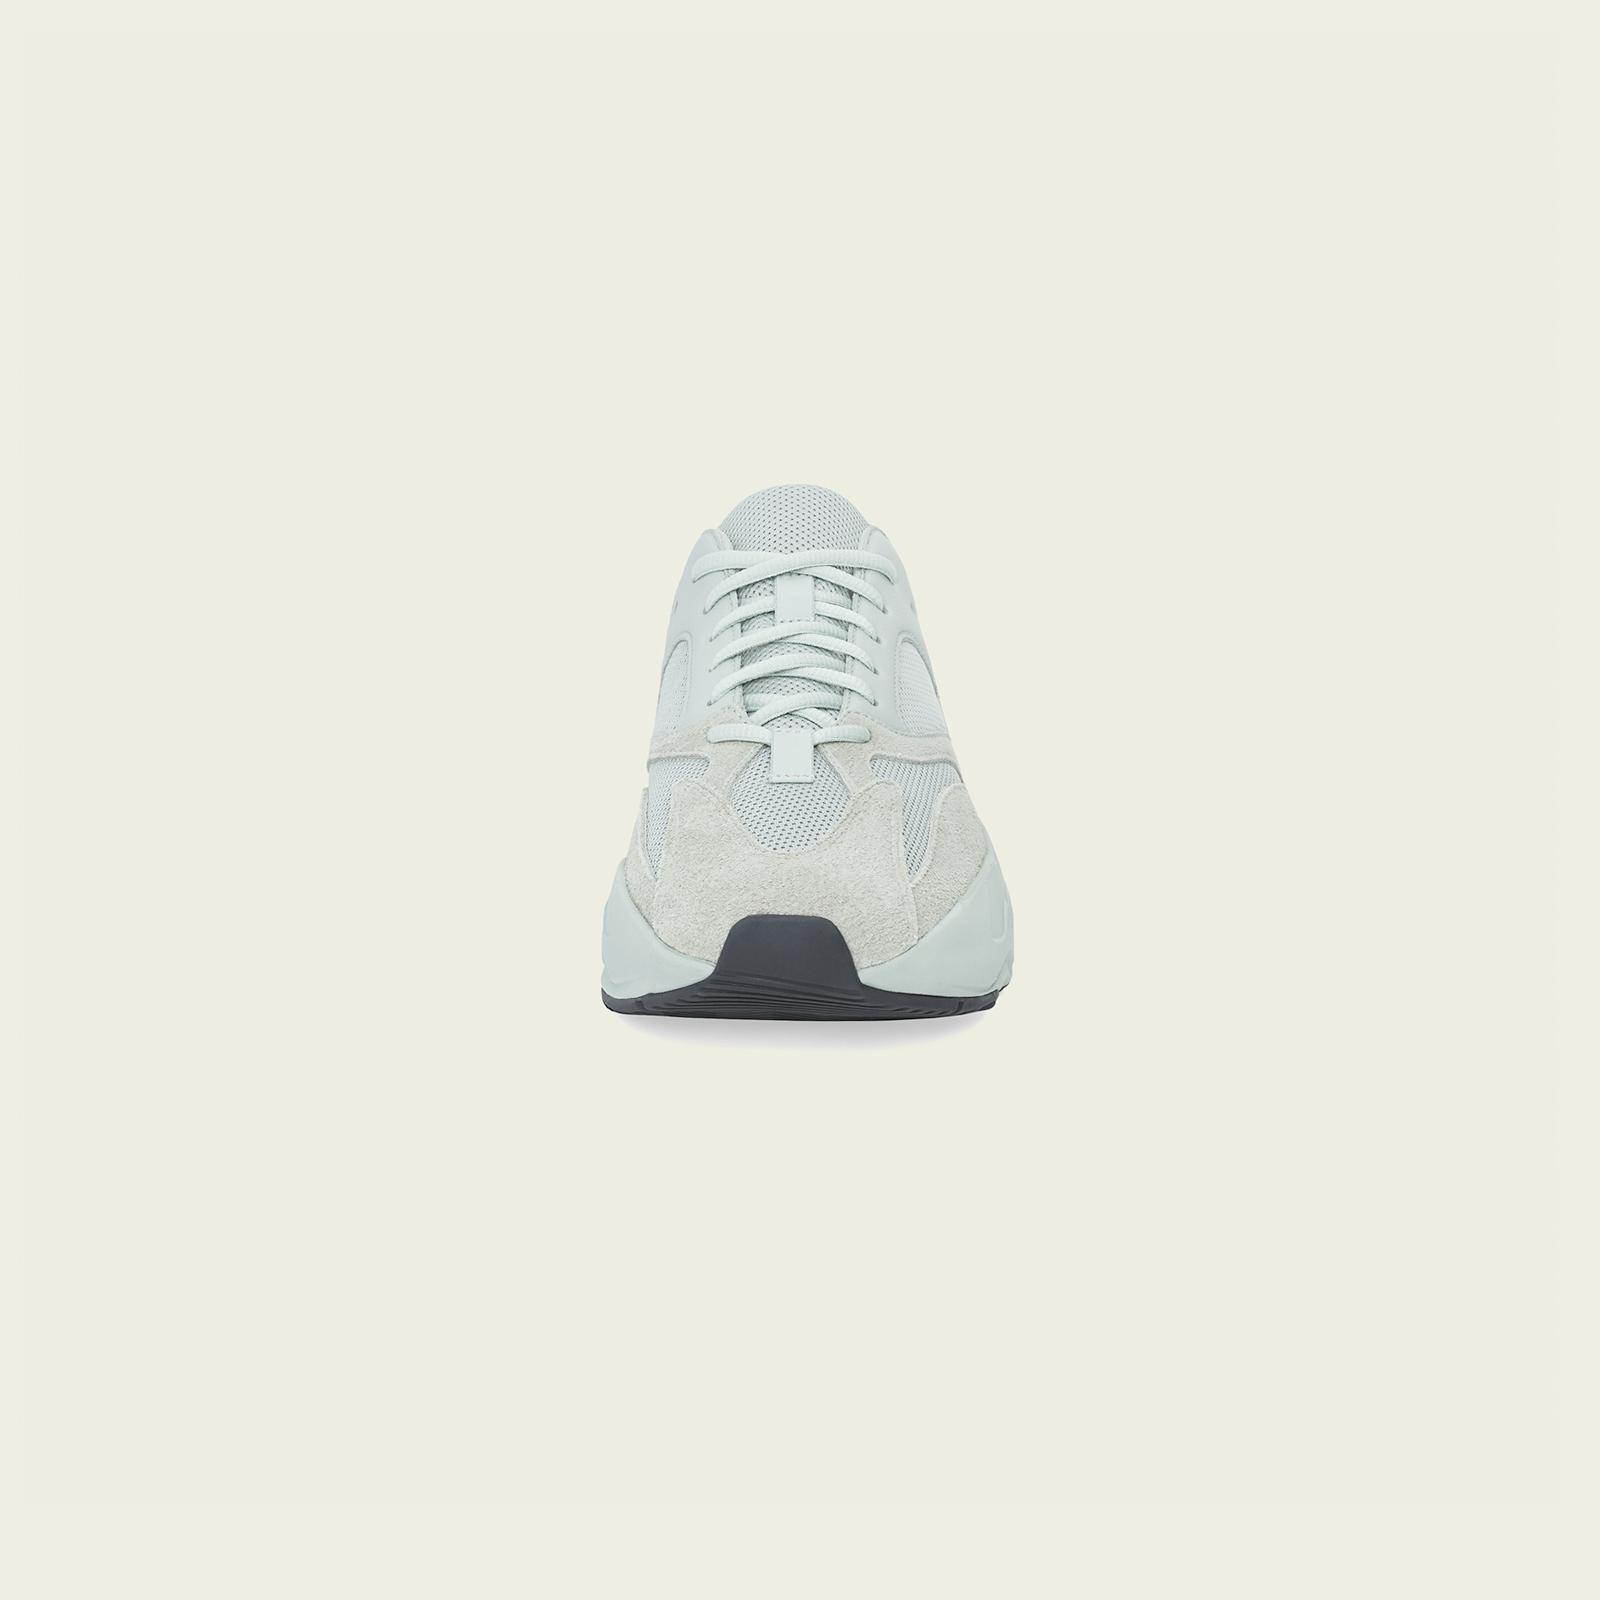 18df5a0f0 adidas Yeezy Boost 700 - Eg7487 - Sneakersnstuff